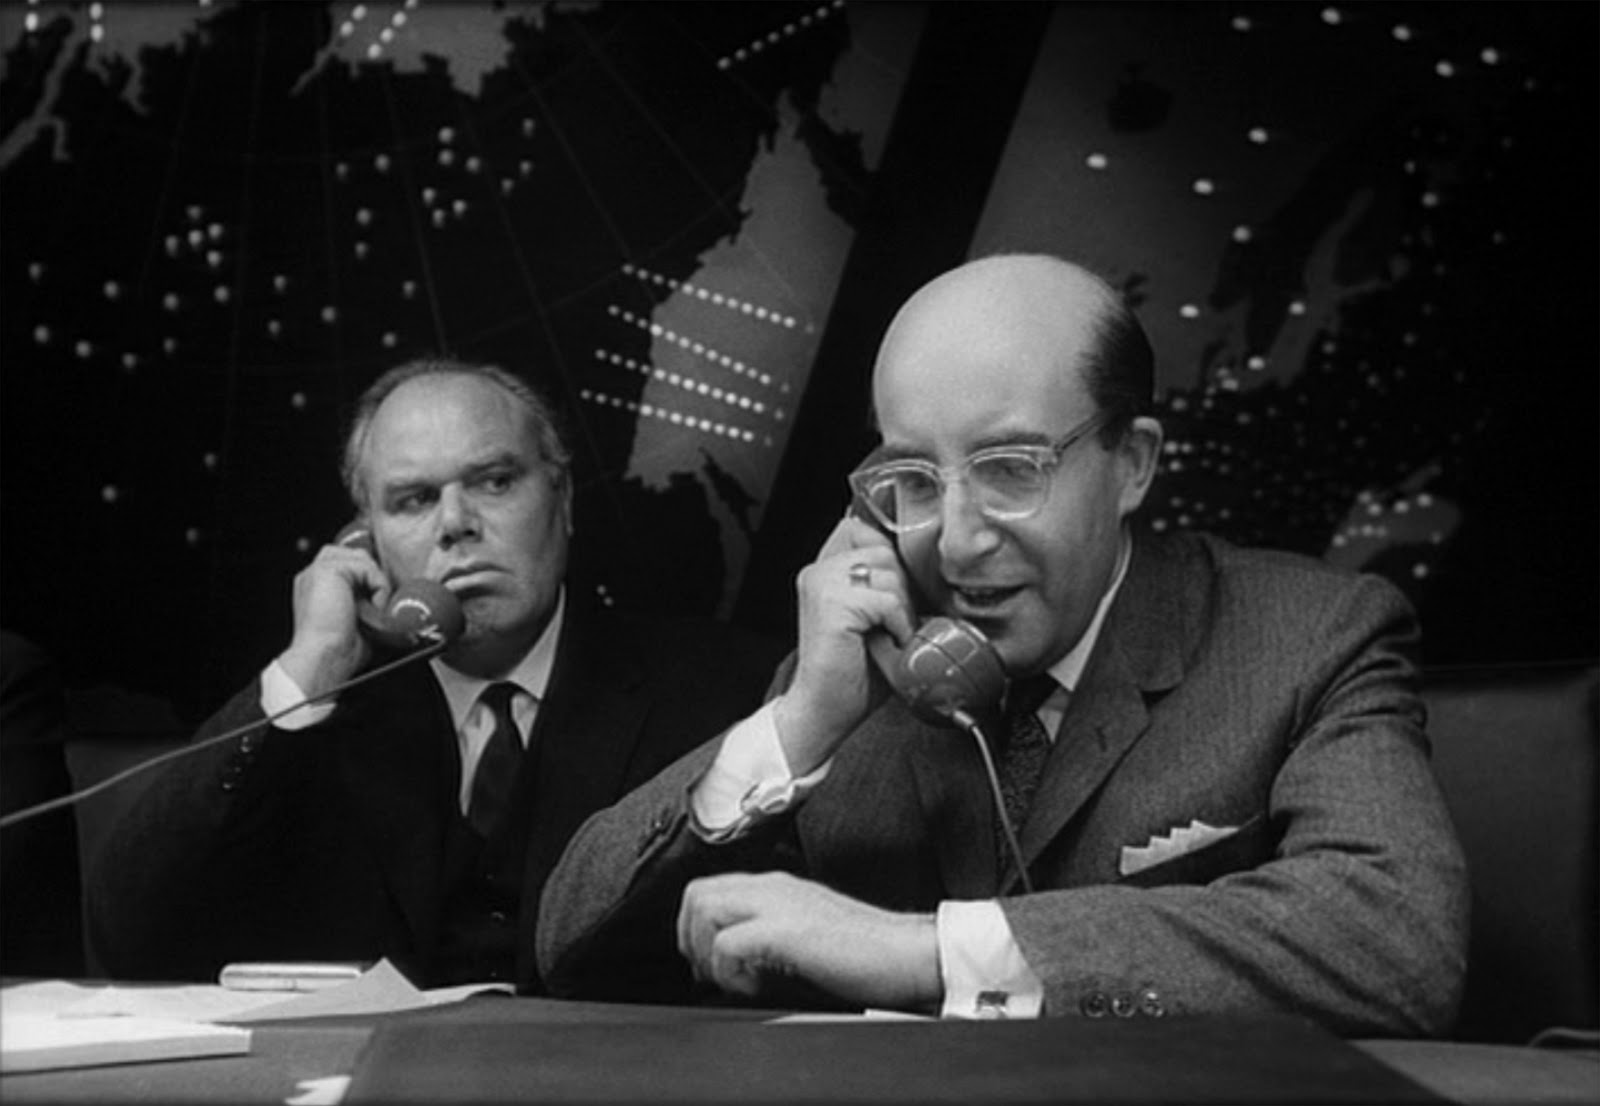 President Muffley (Peter Sellers) on the hotline phone with Premier Kissoff as Russian Ambassador de Sadesky (Peter Bull) listens in. From Stanley Kubrick's dark satire  Dr. Strangelove .